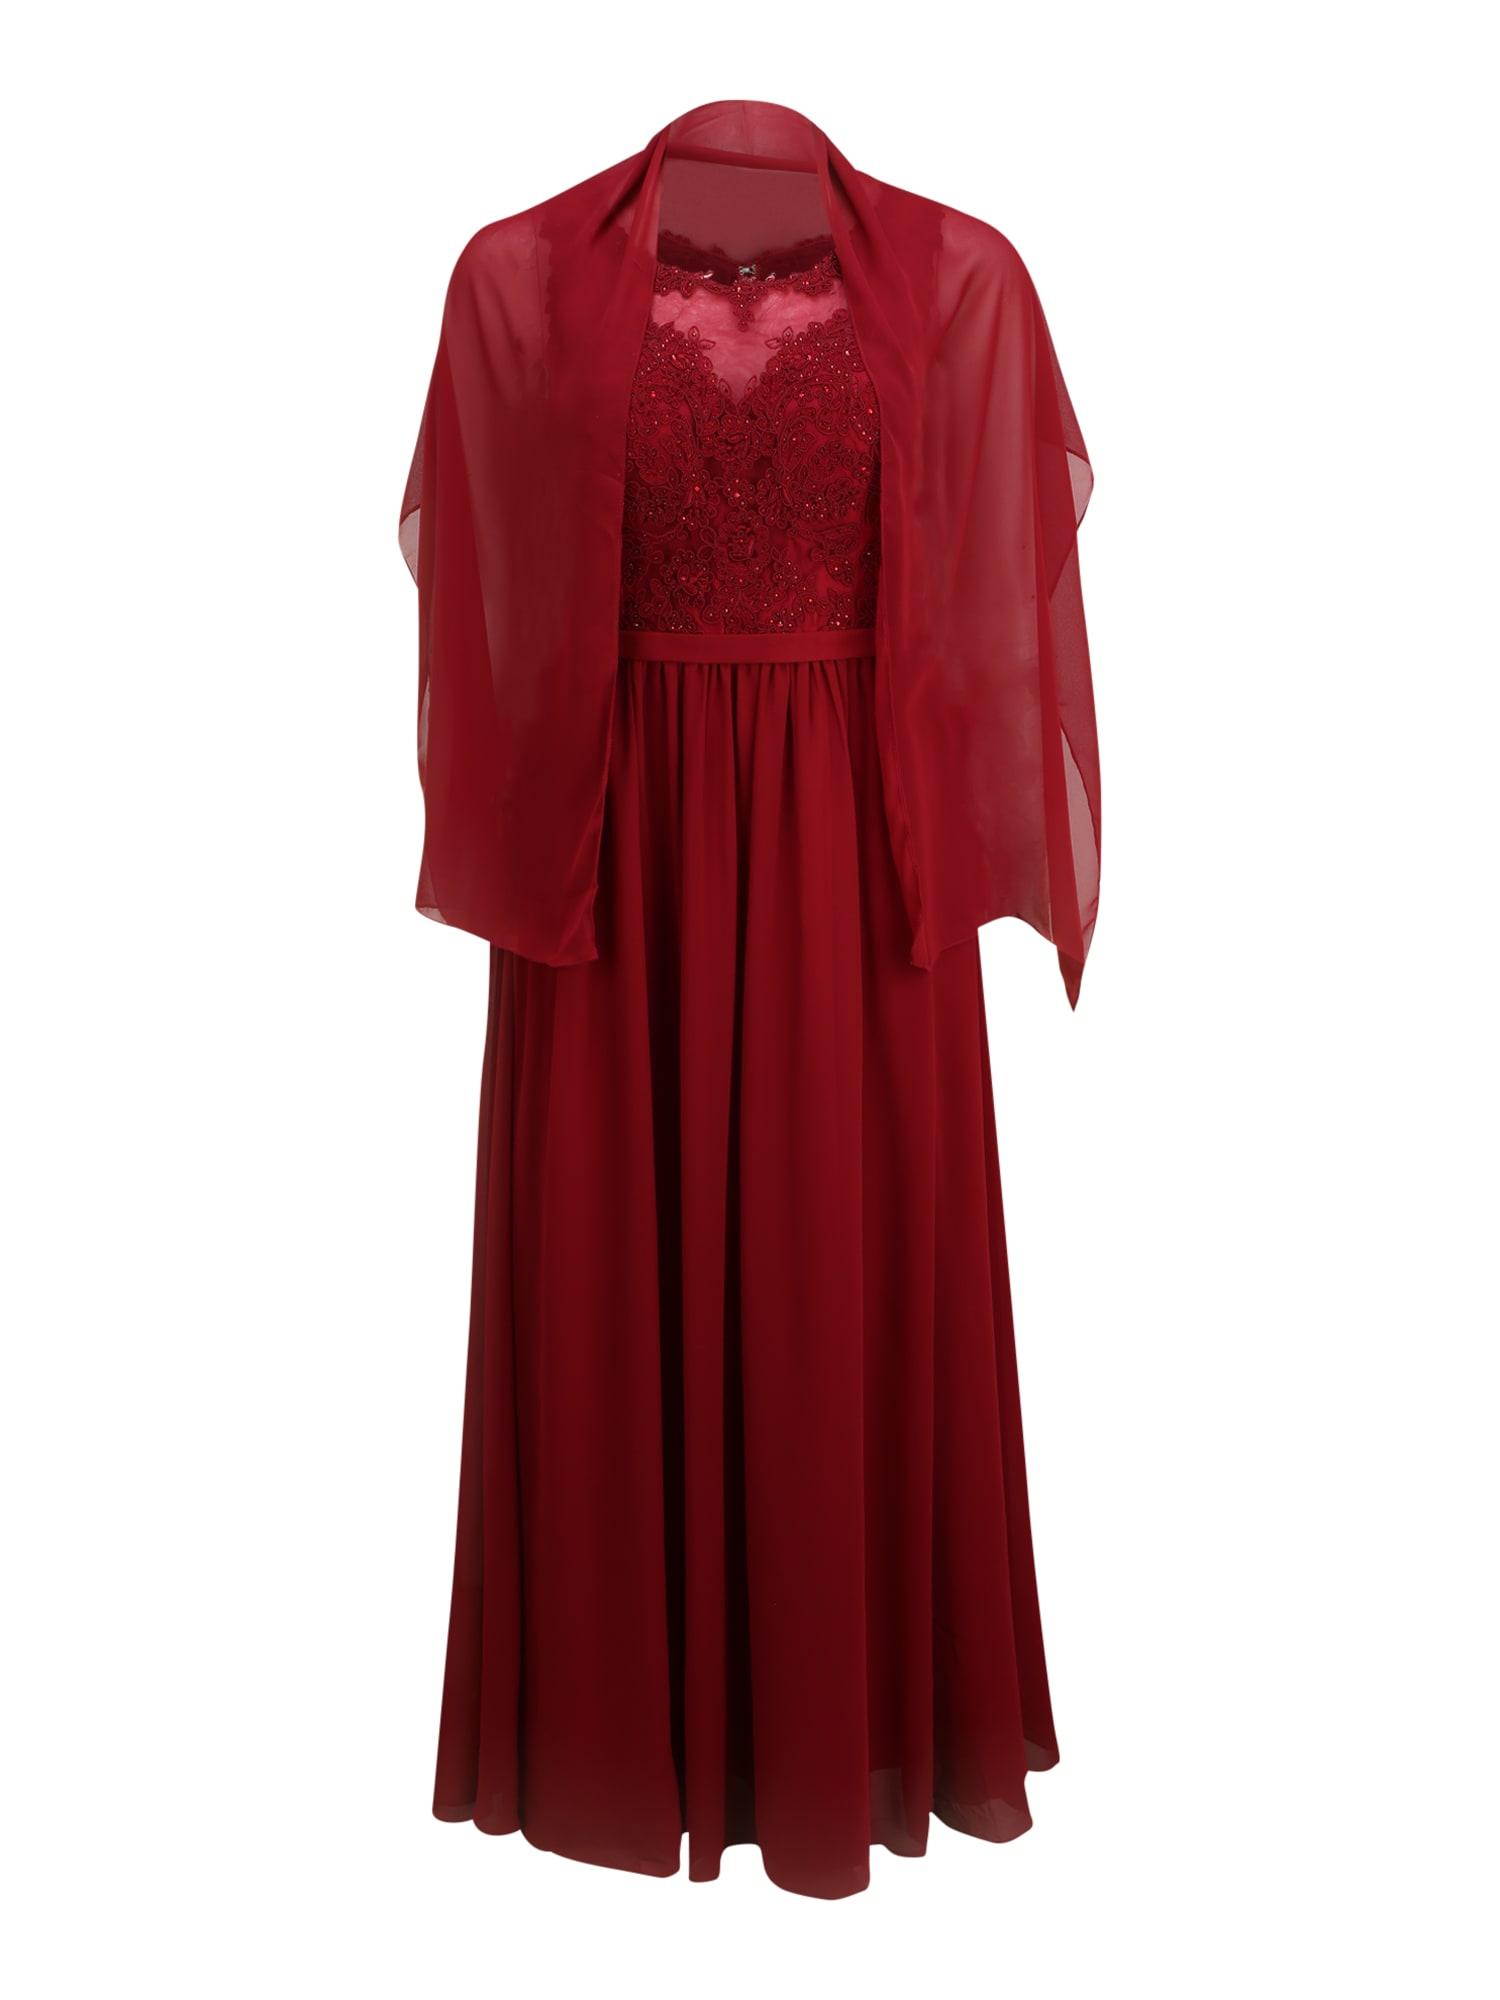 My Mascara Curves Večerné šaty  vínovo červená